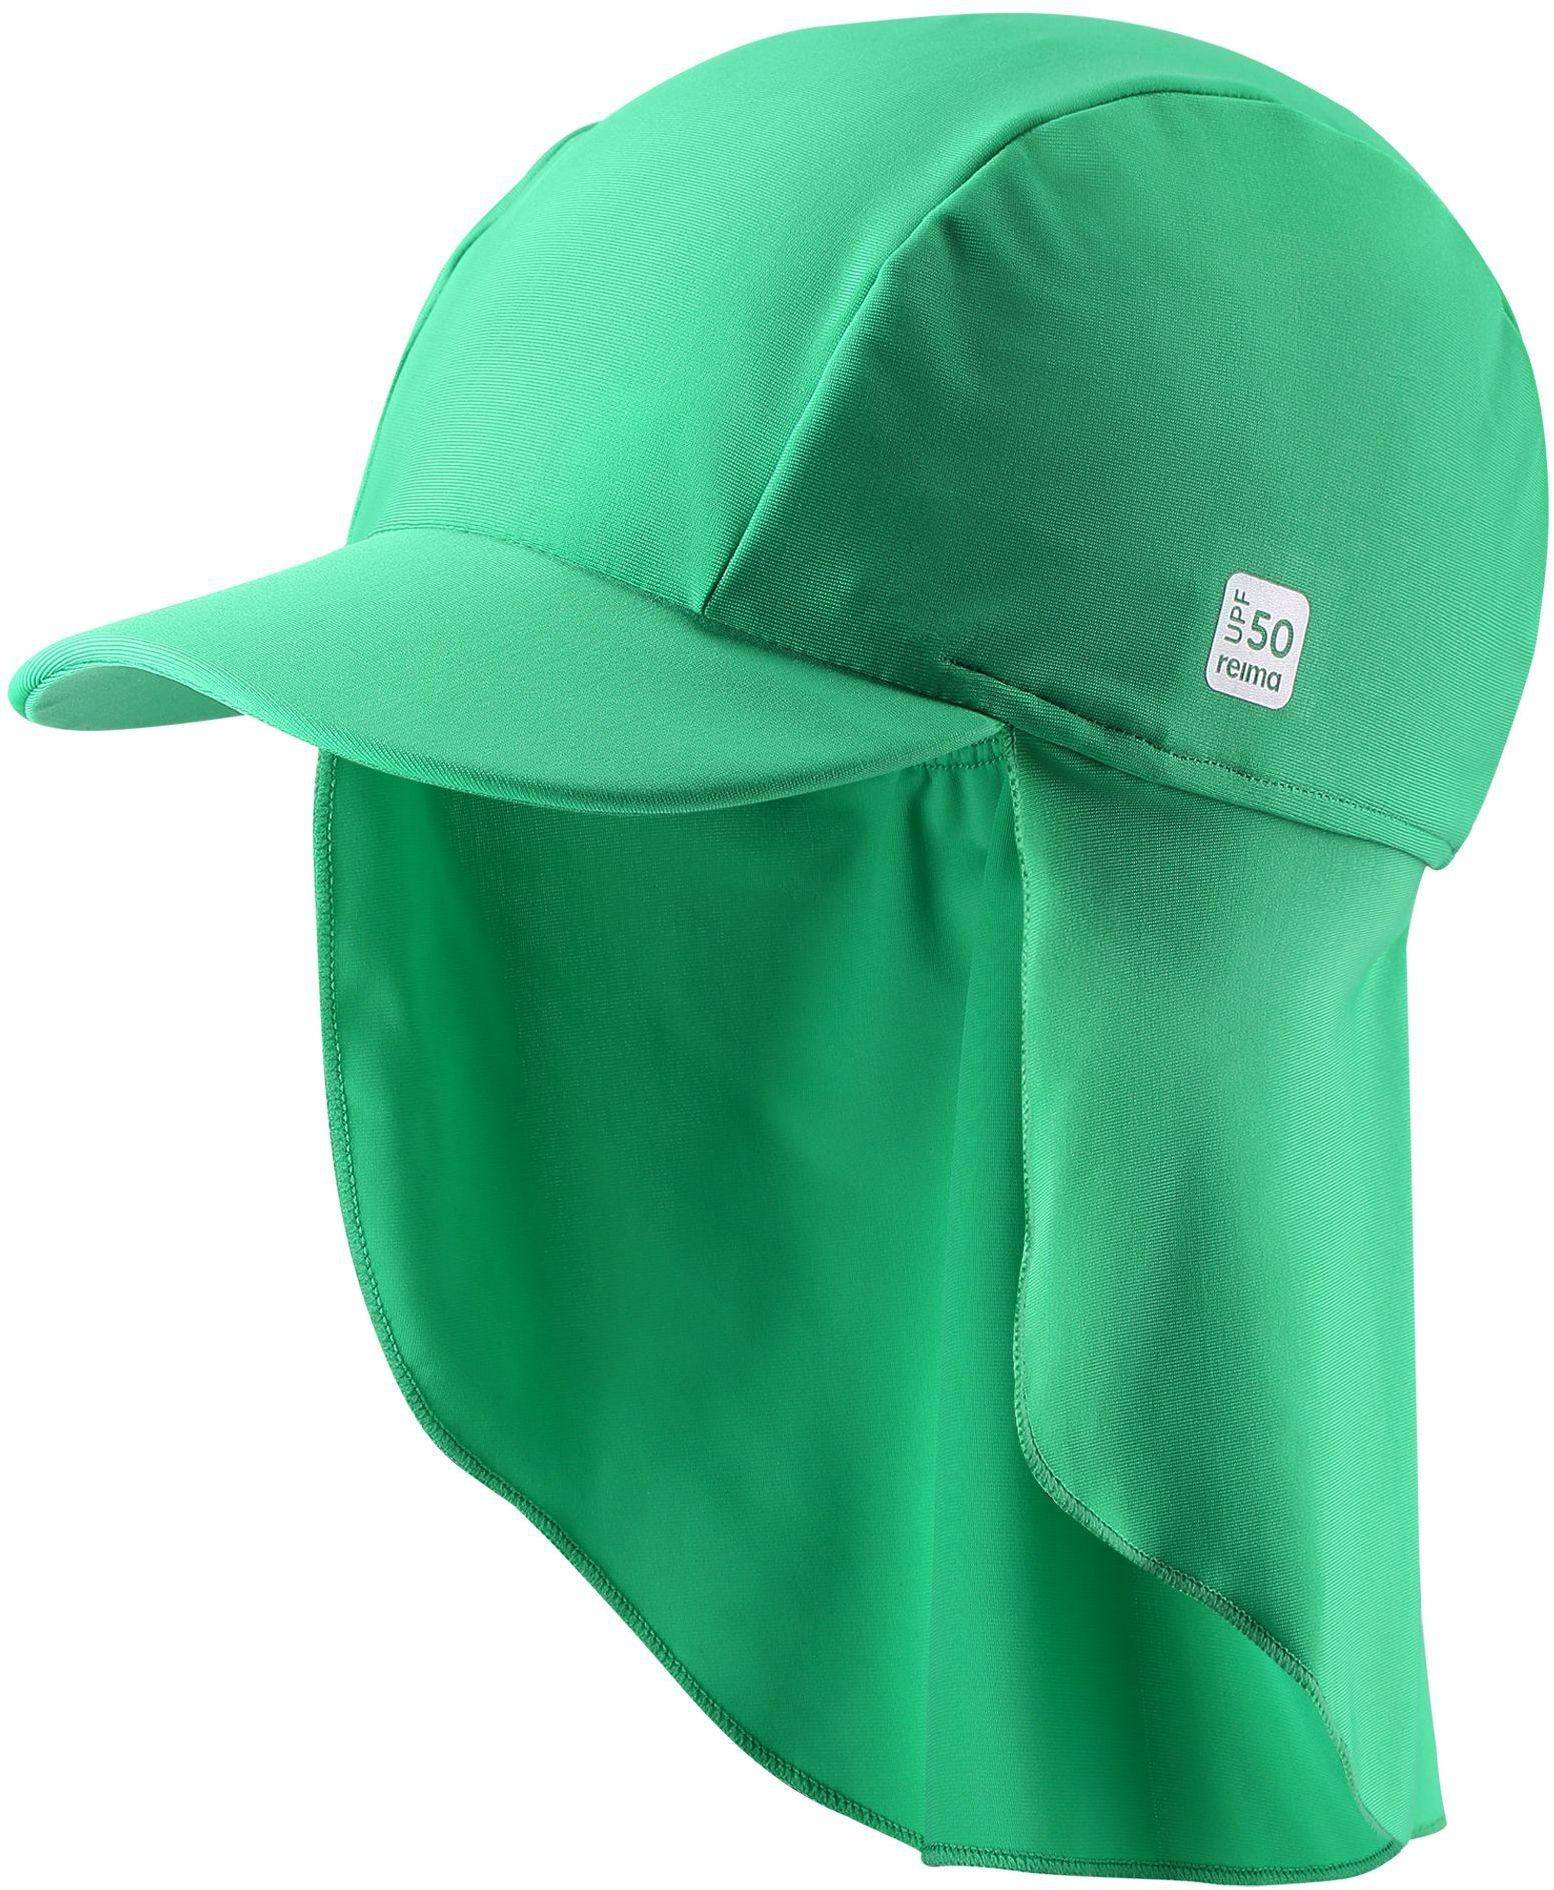 Reima Turtle - Green klobuk na kupanie s ochranou krku